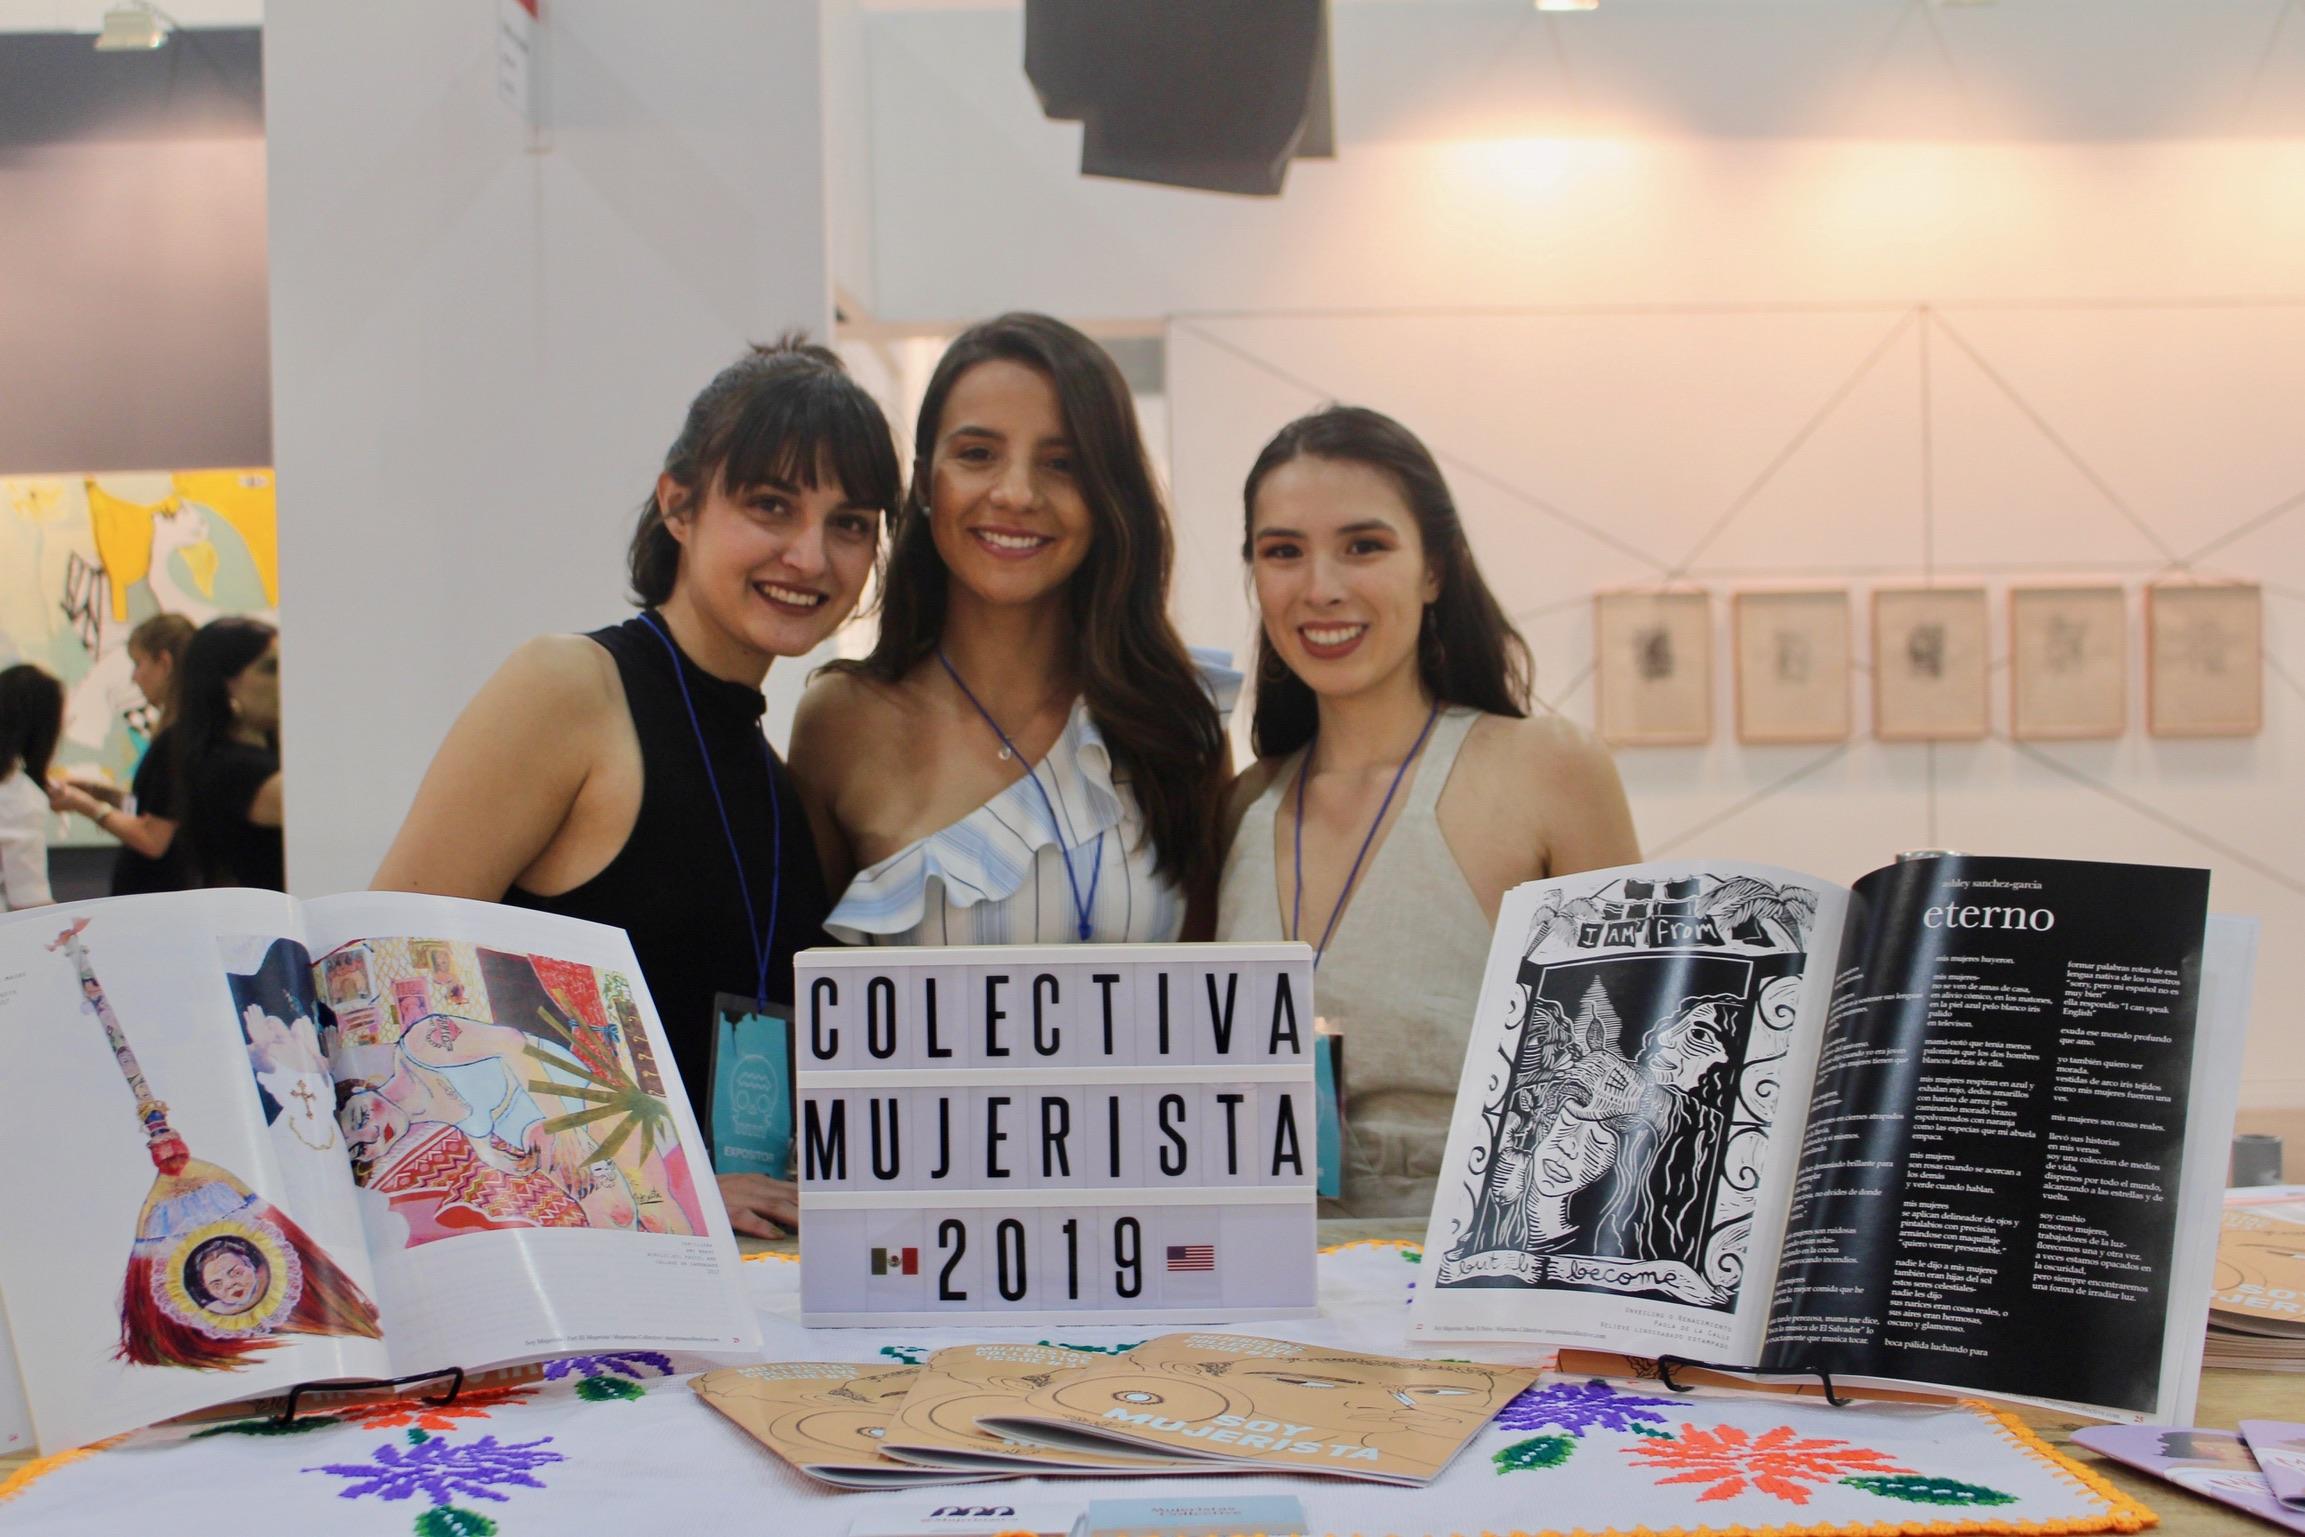 Left to right: Reza Moreno (editor), Denisse Jimenez (content producer), and Stephanie Aliaga (founder) at Zonamaco, Mexico City in February 2019.